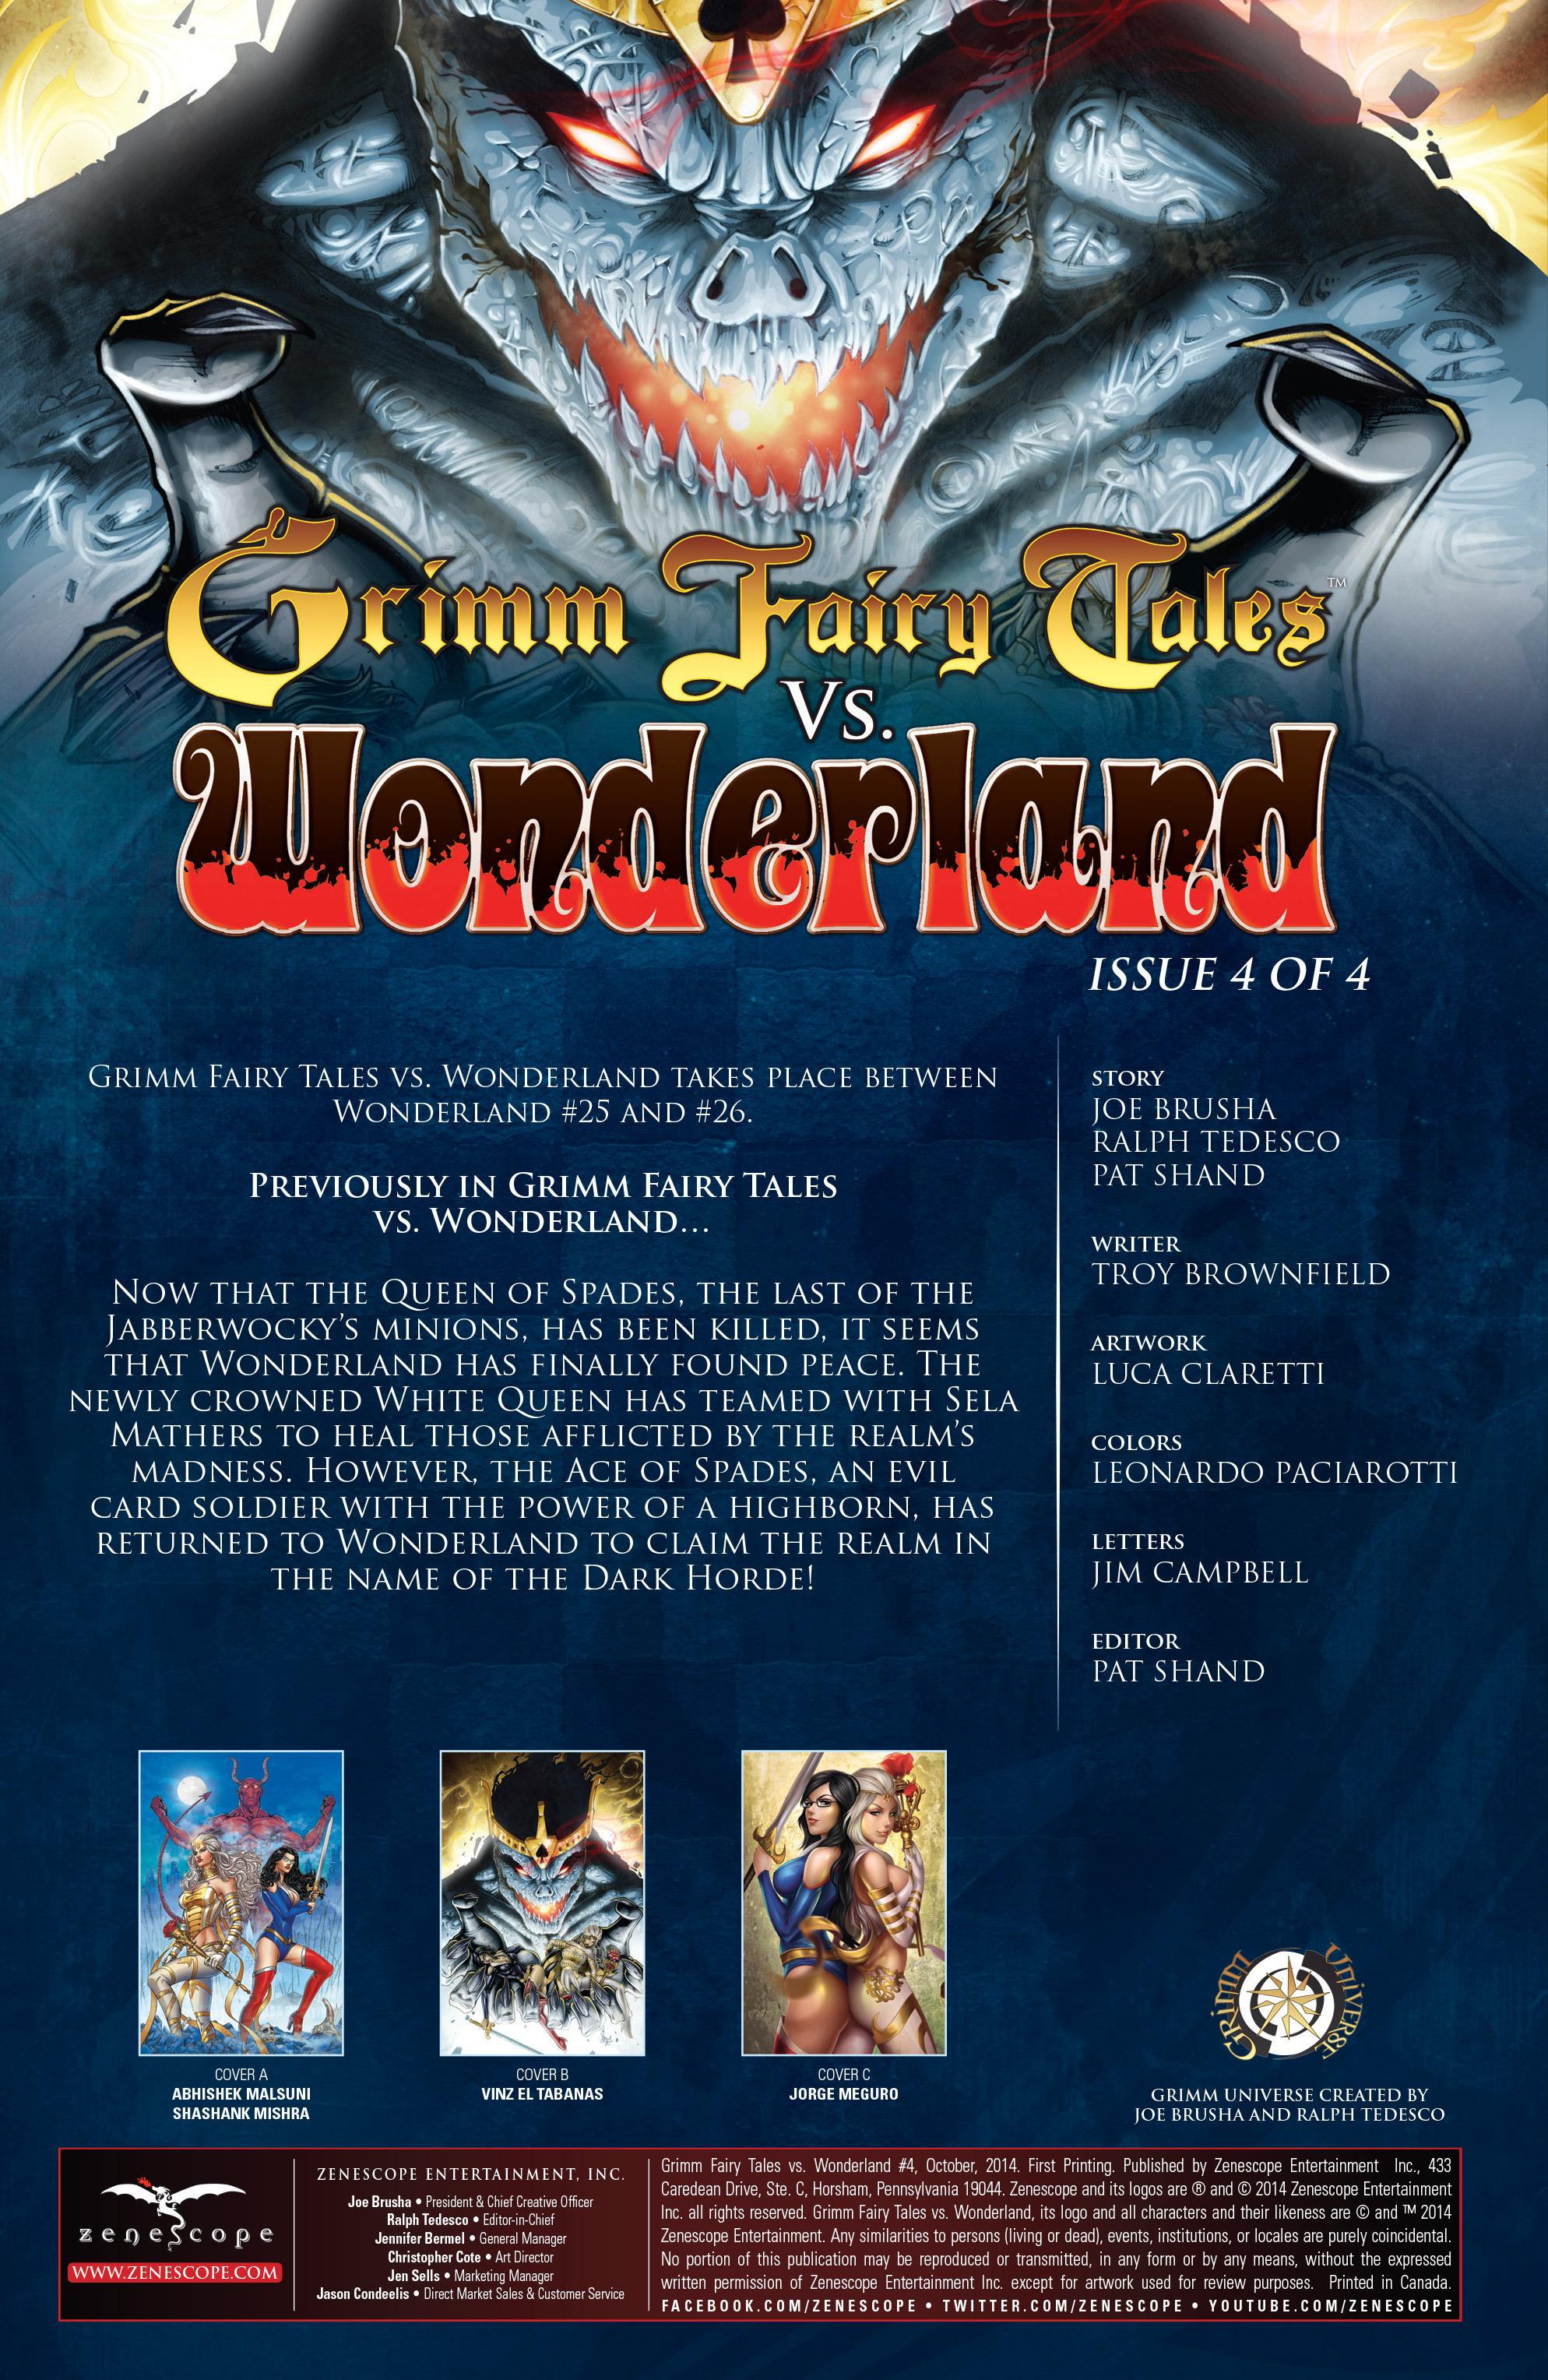 Read online Grimm Fairy Tales vs. Wonderland comic -  Issue #4 - 3